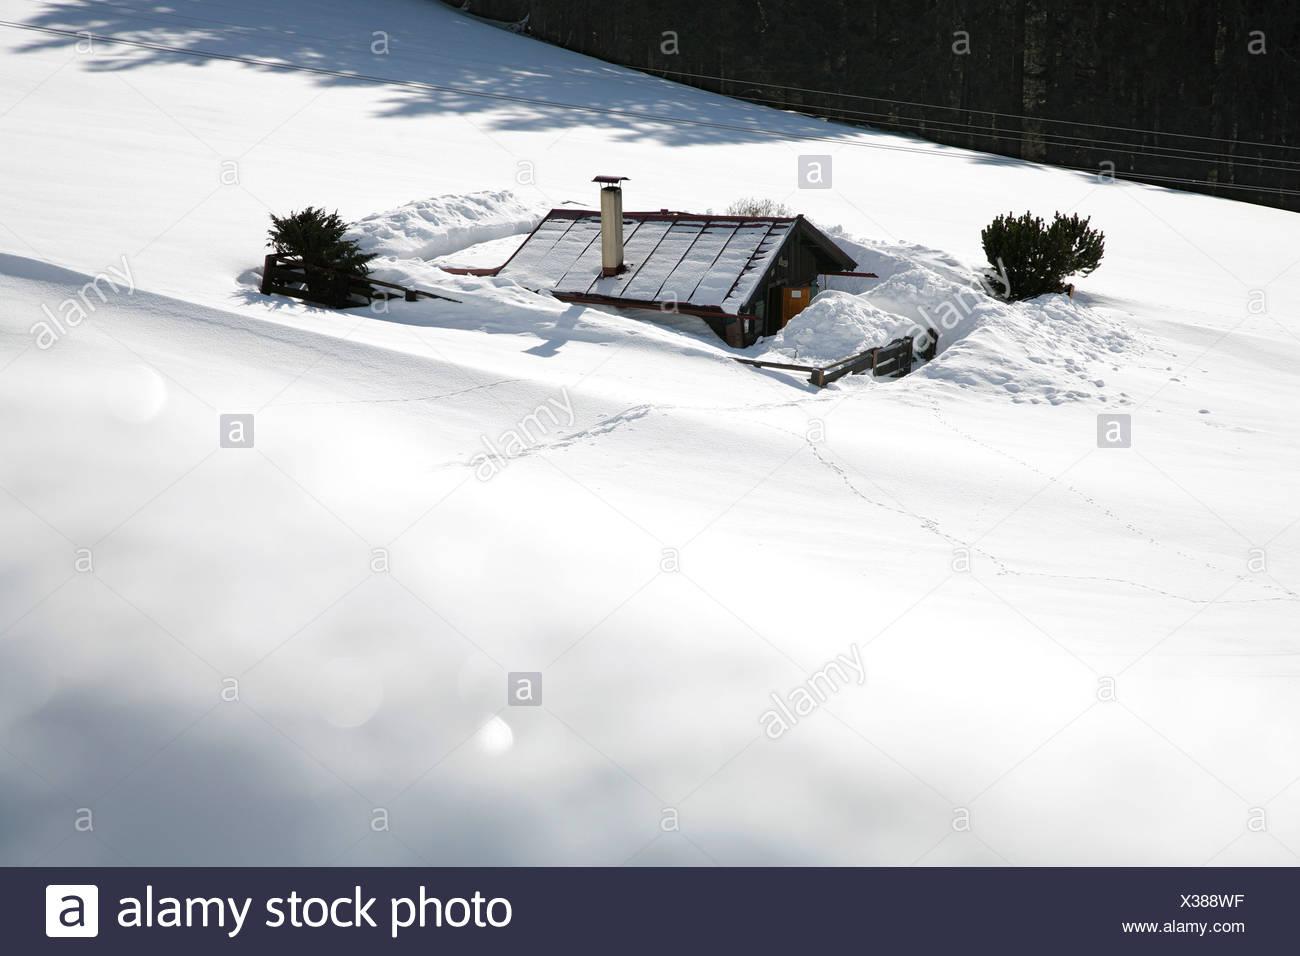 Snowed in mountain hut - Stock Image